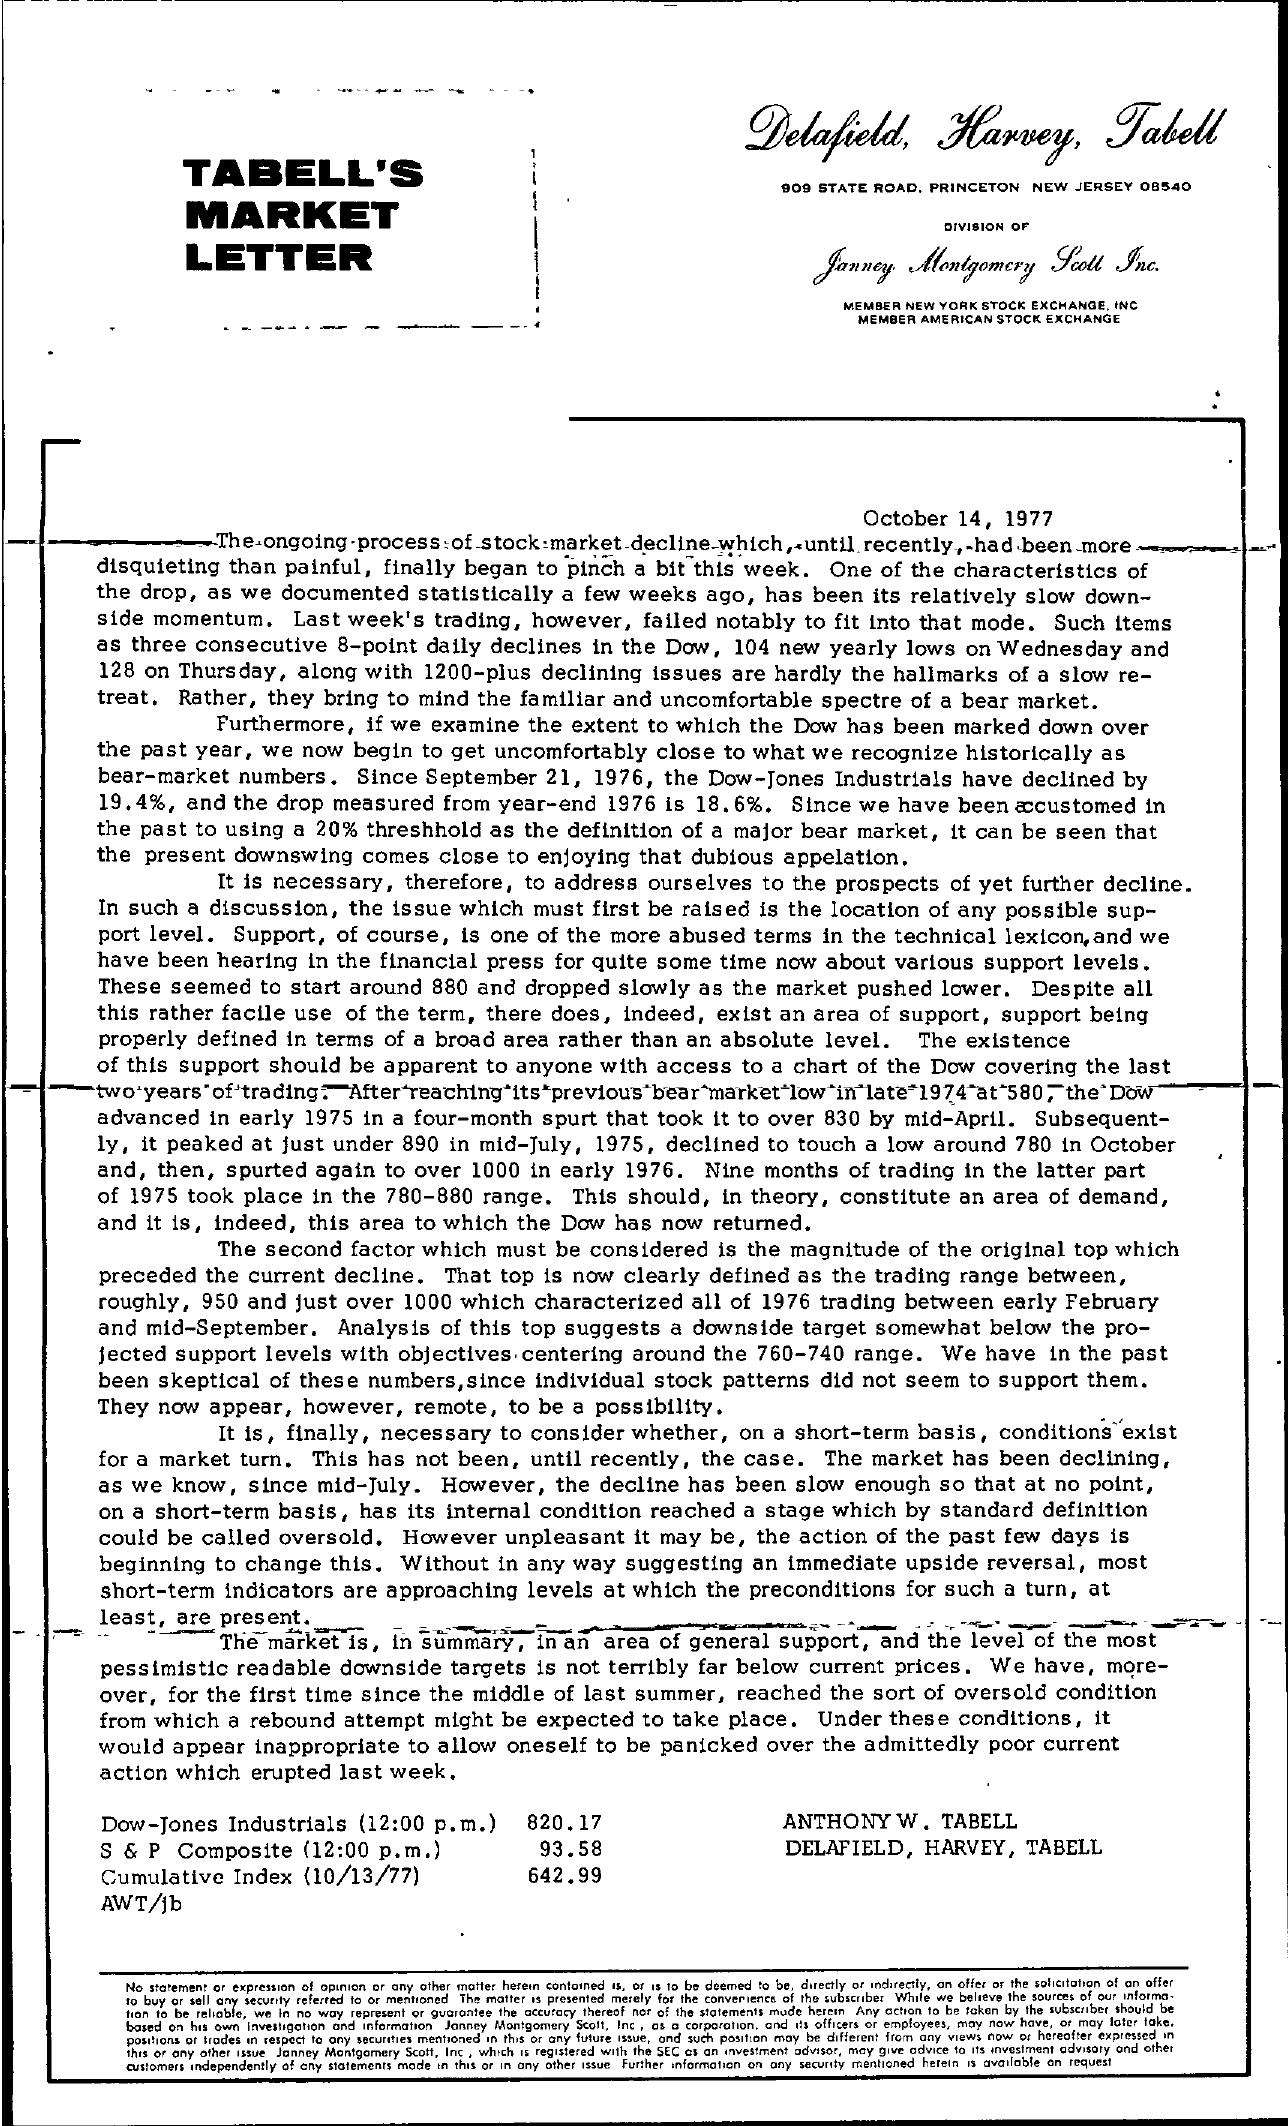 Tabell's Market Letter - October 14, 1977